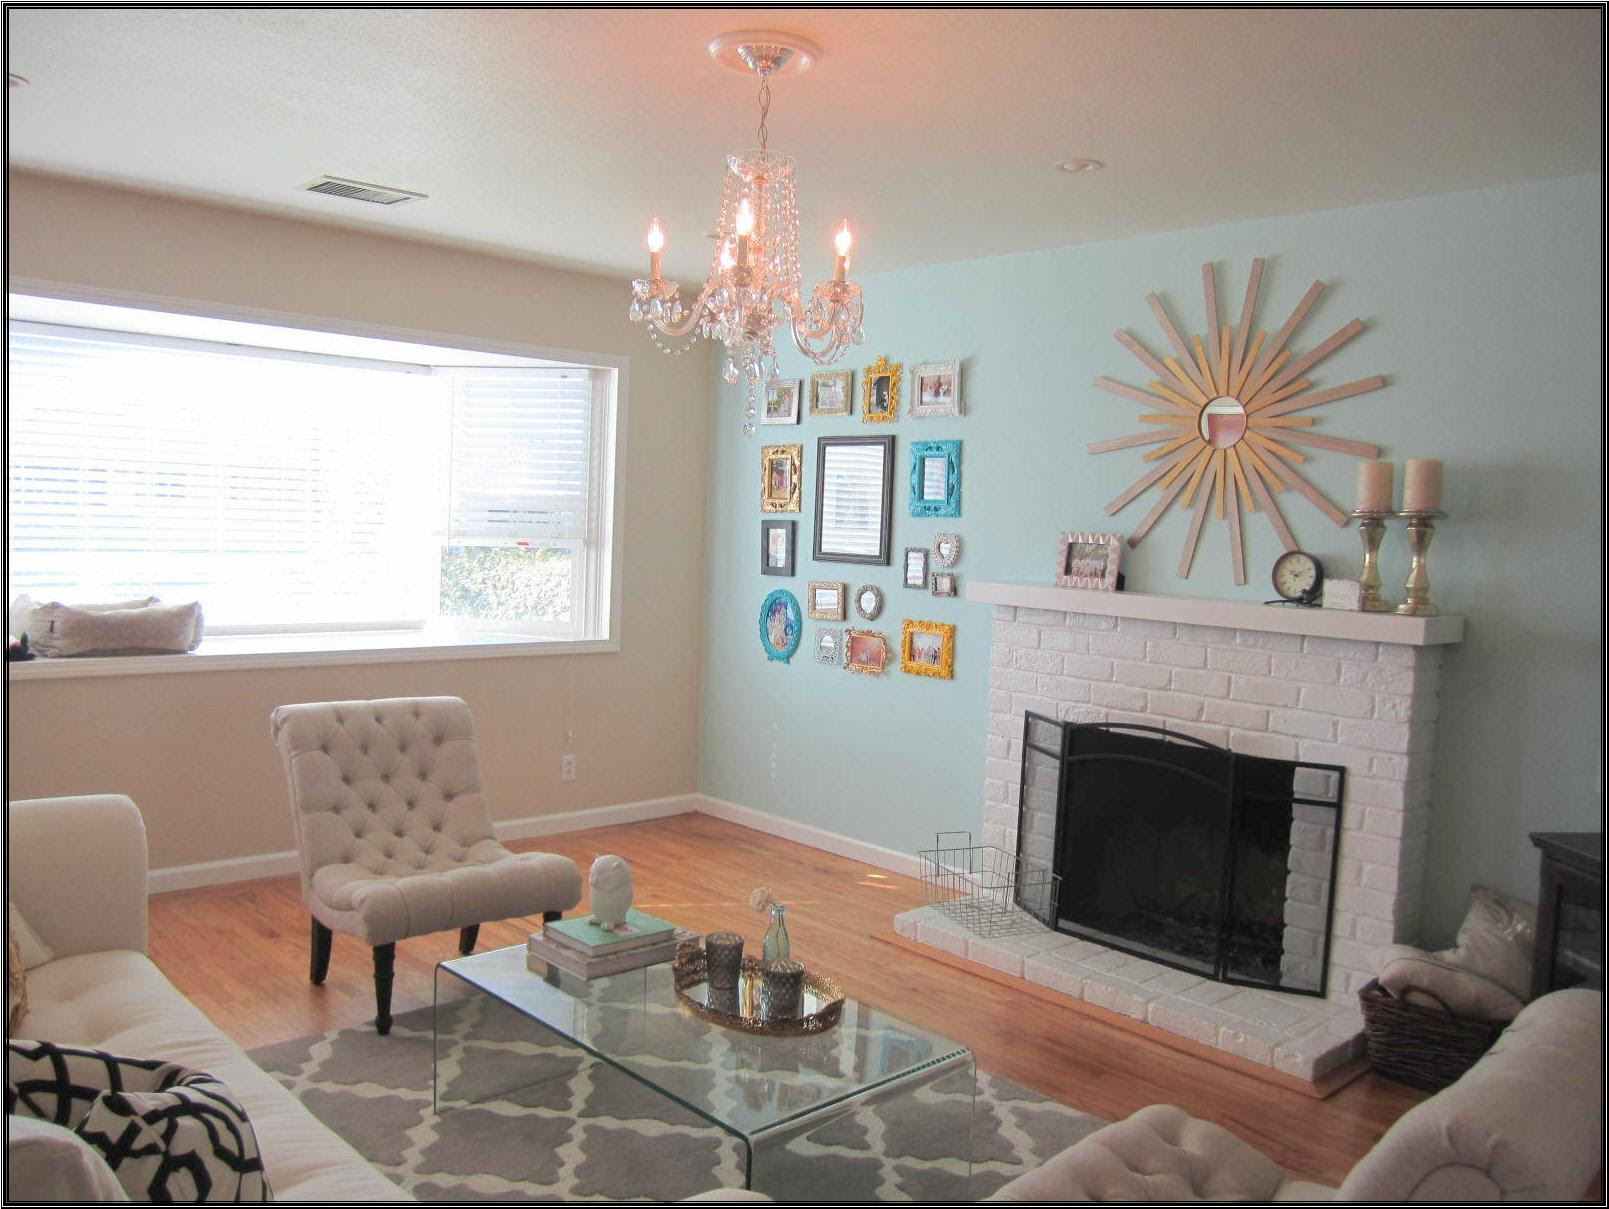 benjamin moore bird's egg color | House To Home Blog